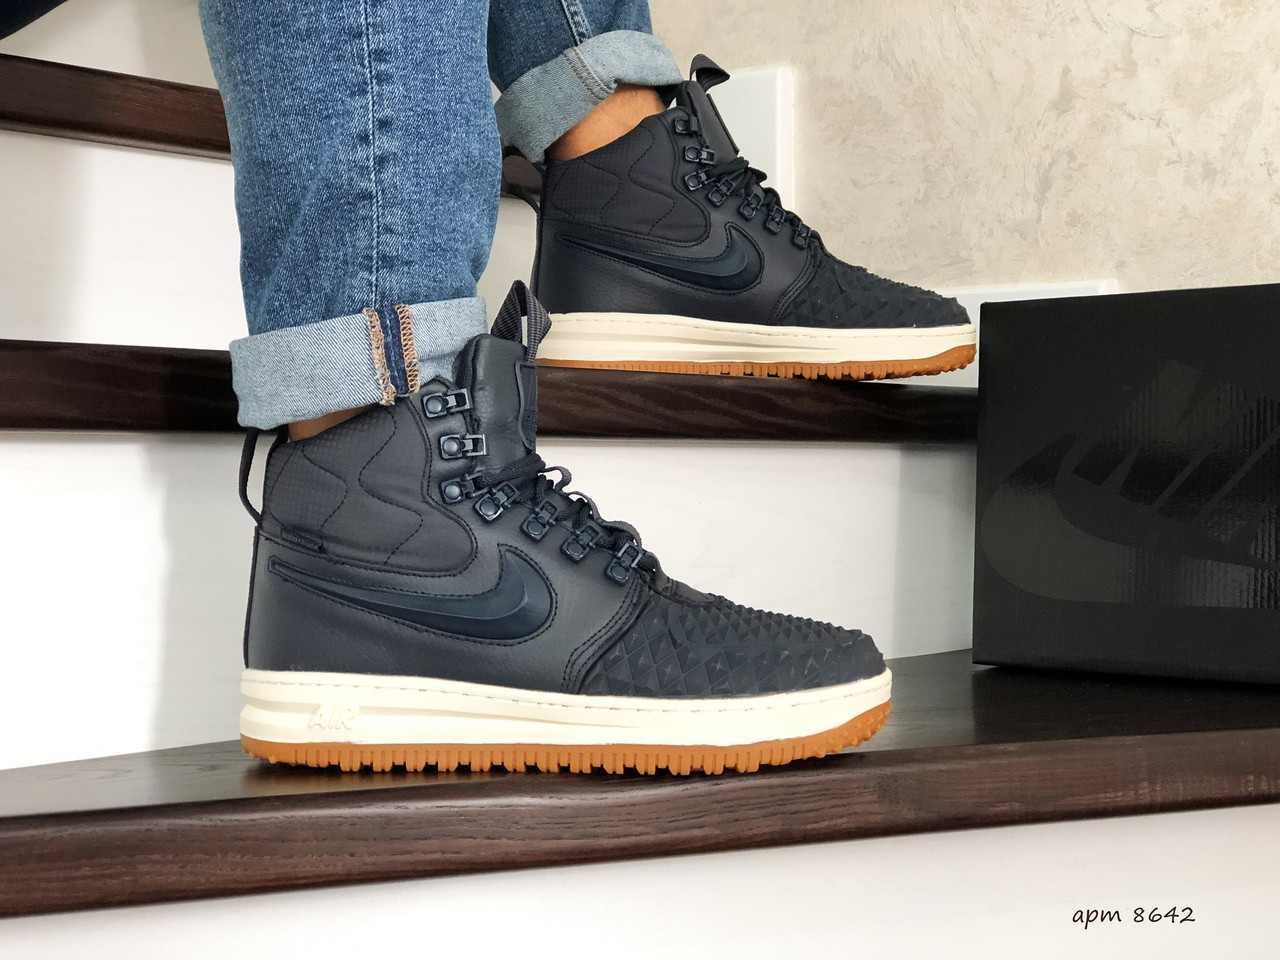 Мужские высокие кроссовки Nike Lunar Force 1 Duckboot,на меху,темно синие